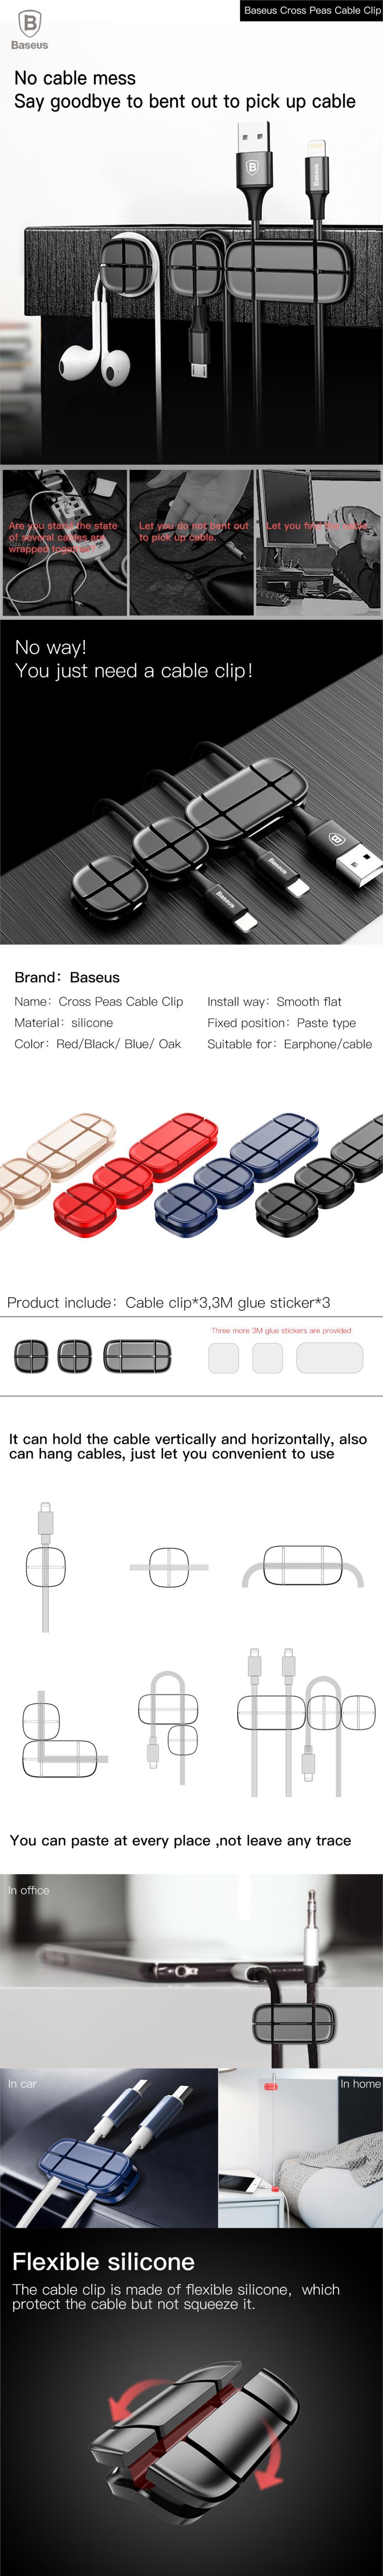 Baseus Cross Pea Cable Clip USB Cable Wire Cord Organizer Management